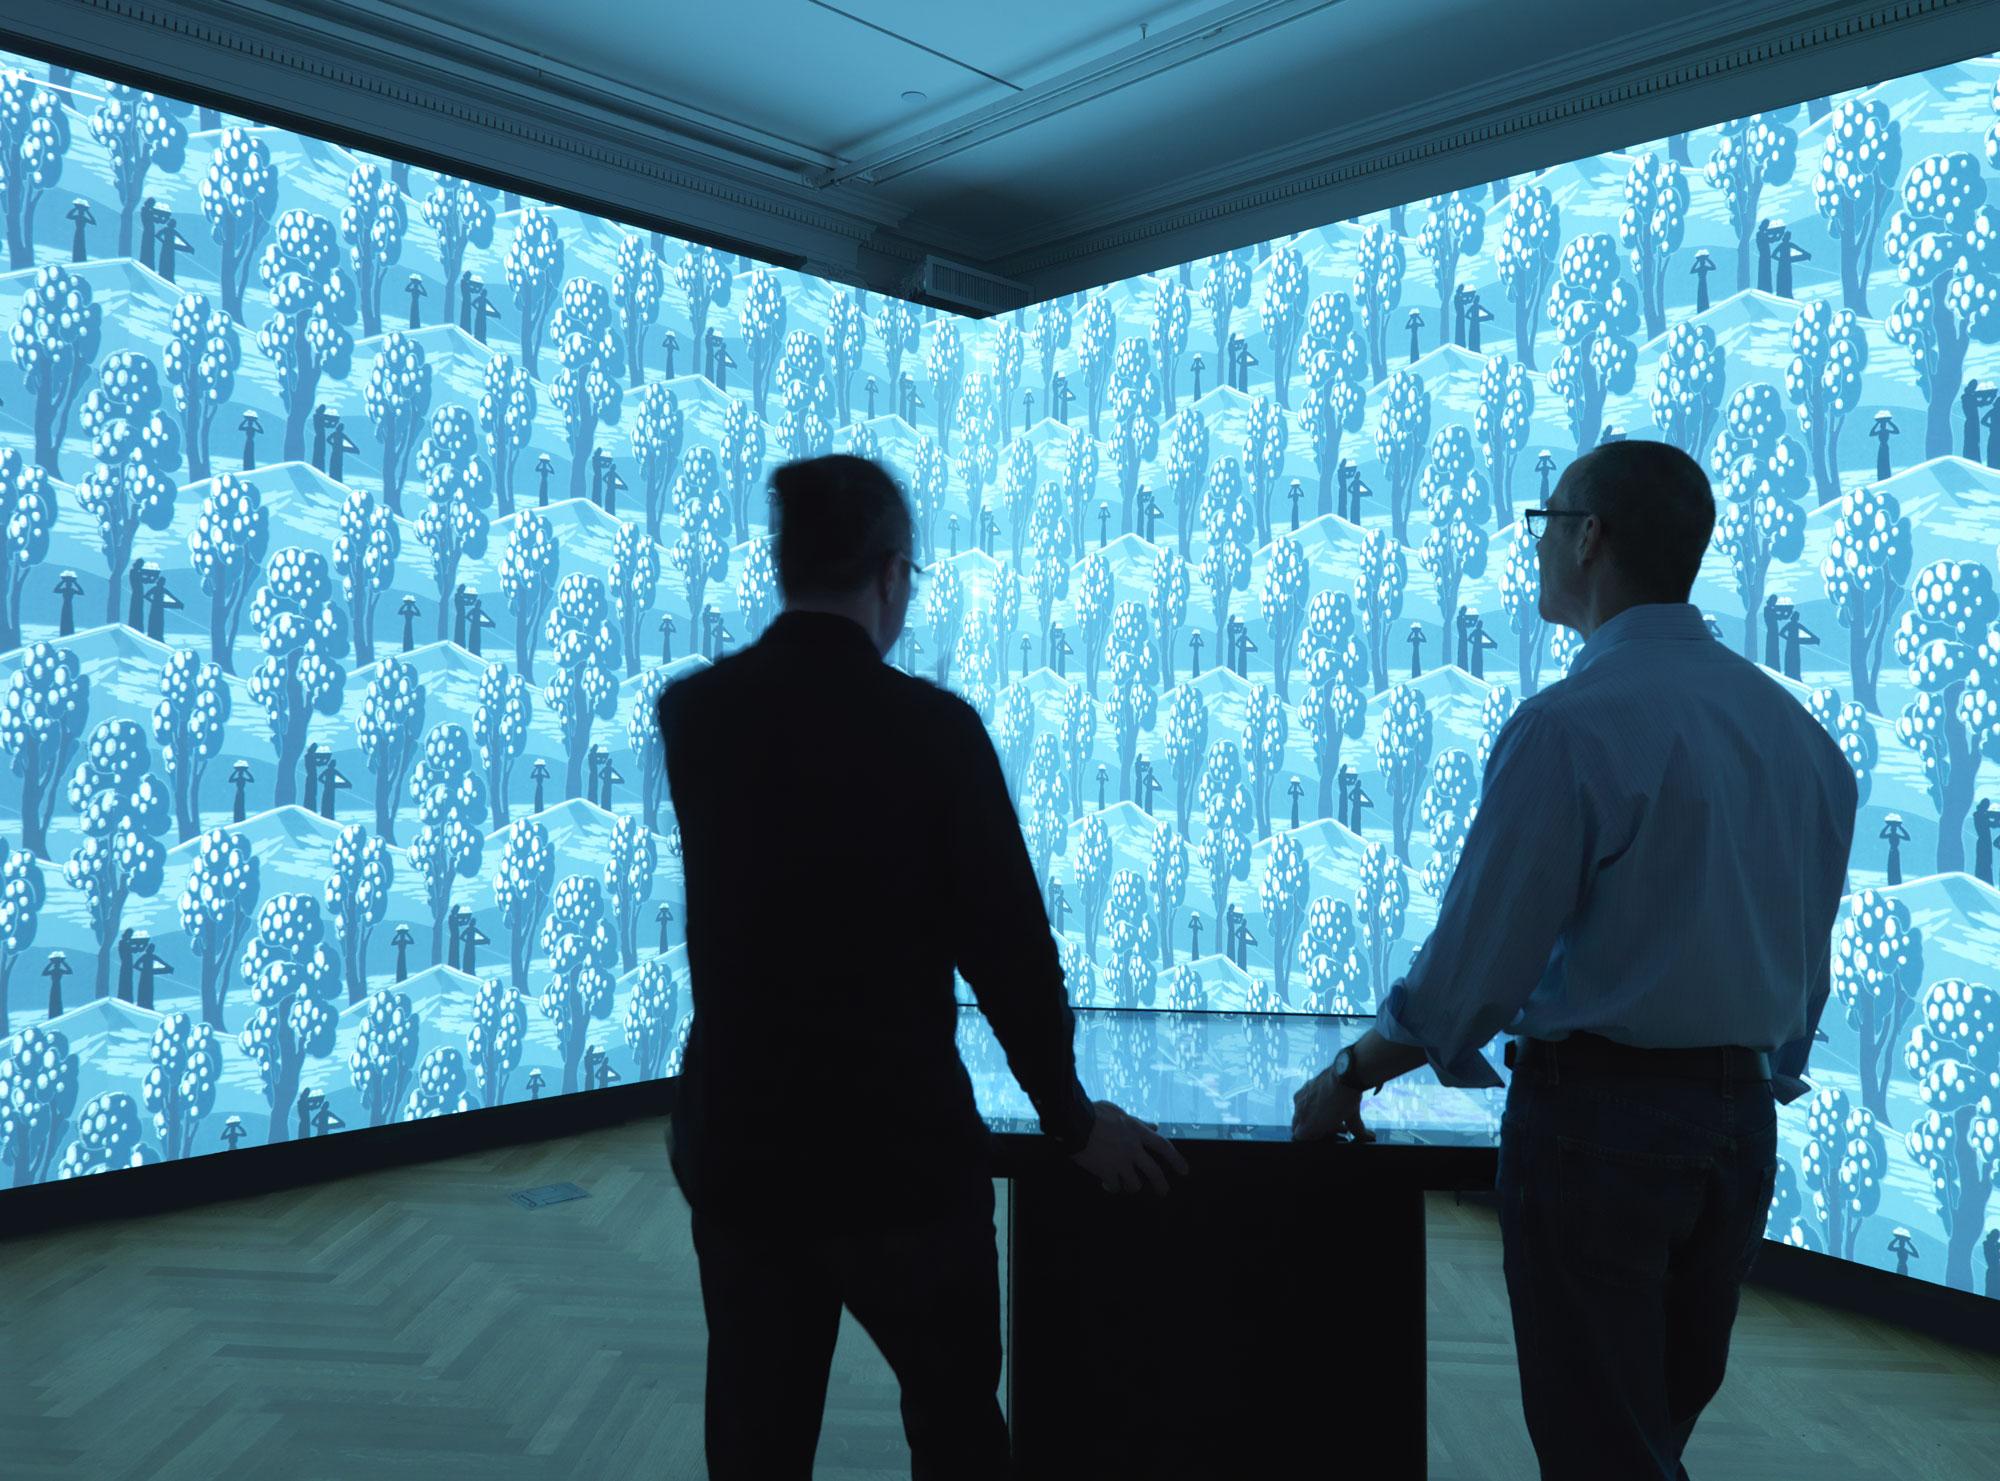 USA installation view of Immersion Room. Photo Matt Flynn© 2014 CooperHewitt, Smithsonian Design Museum